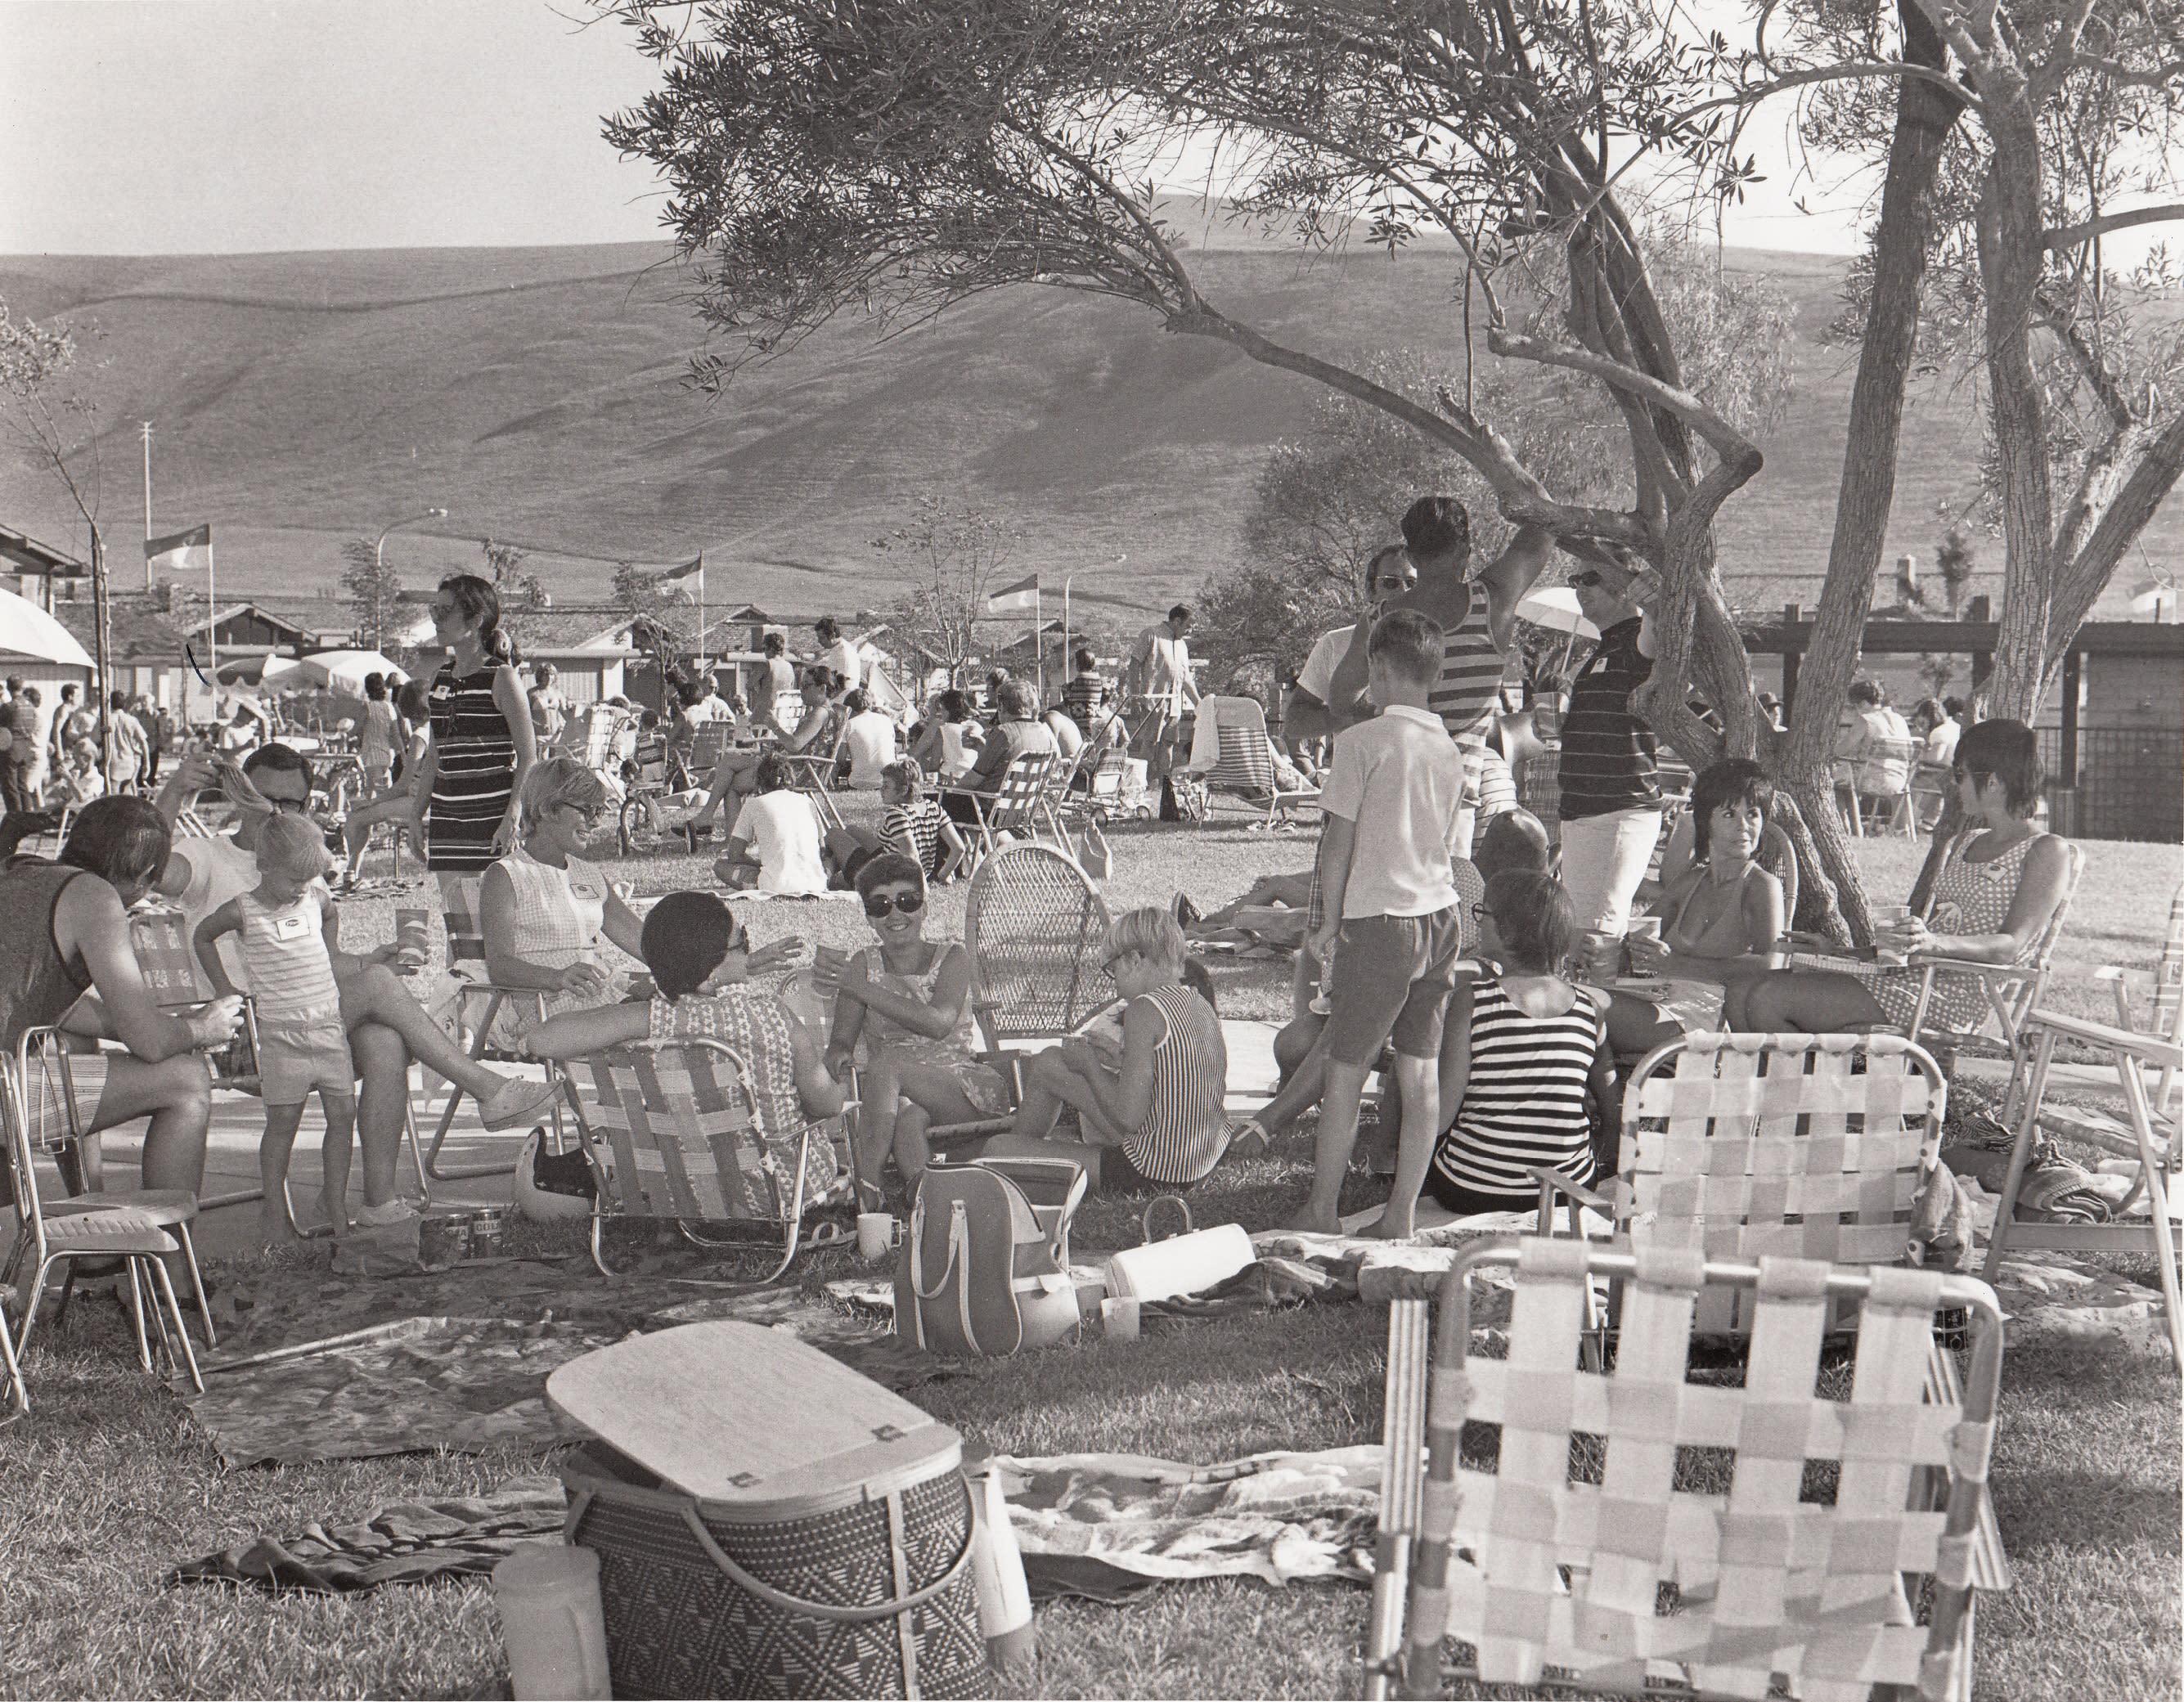 Community Gathering in Irvine